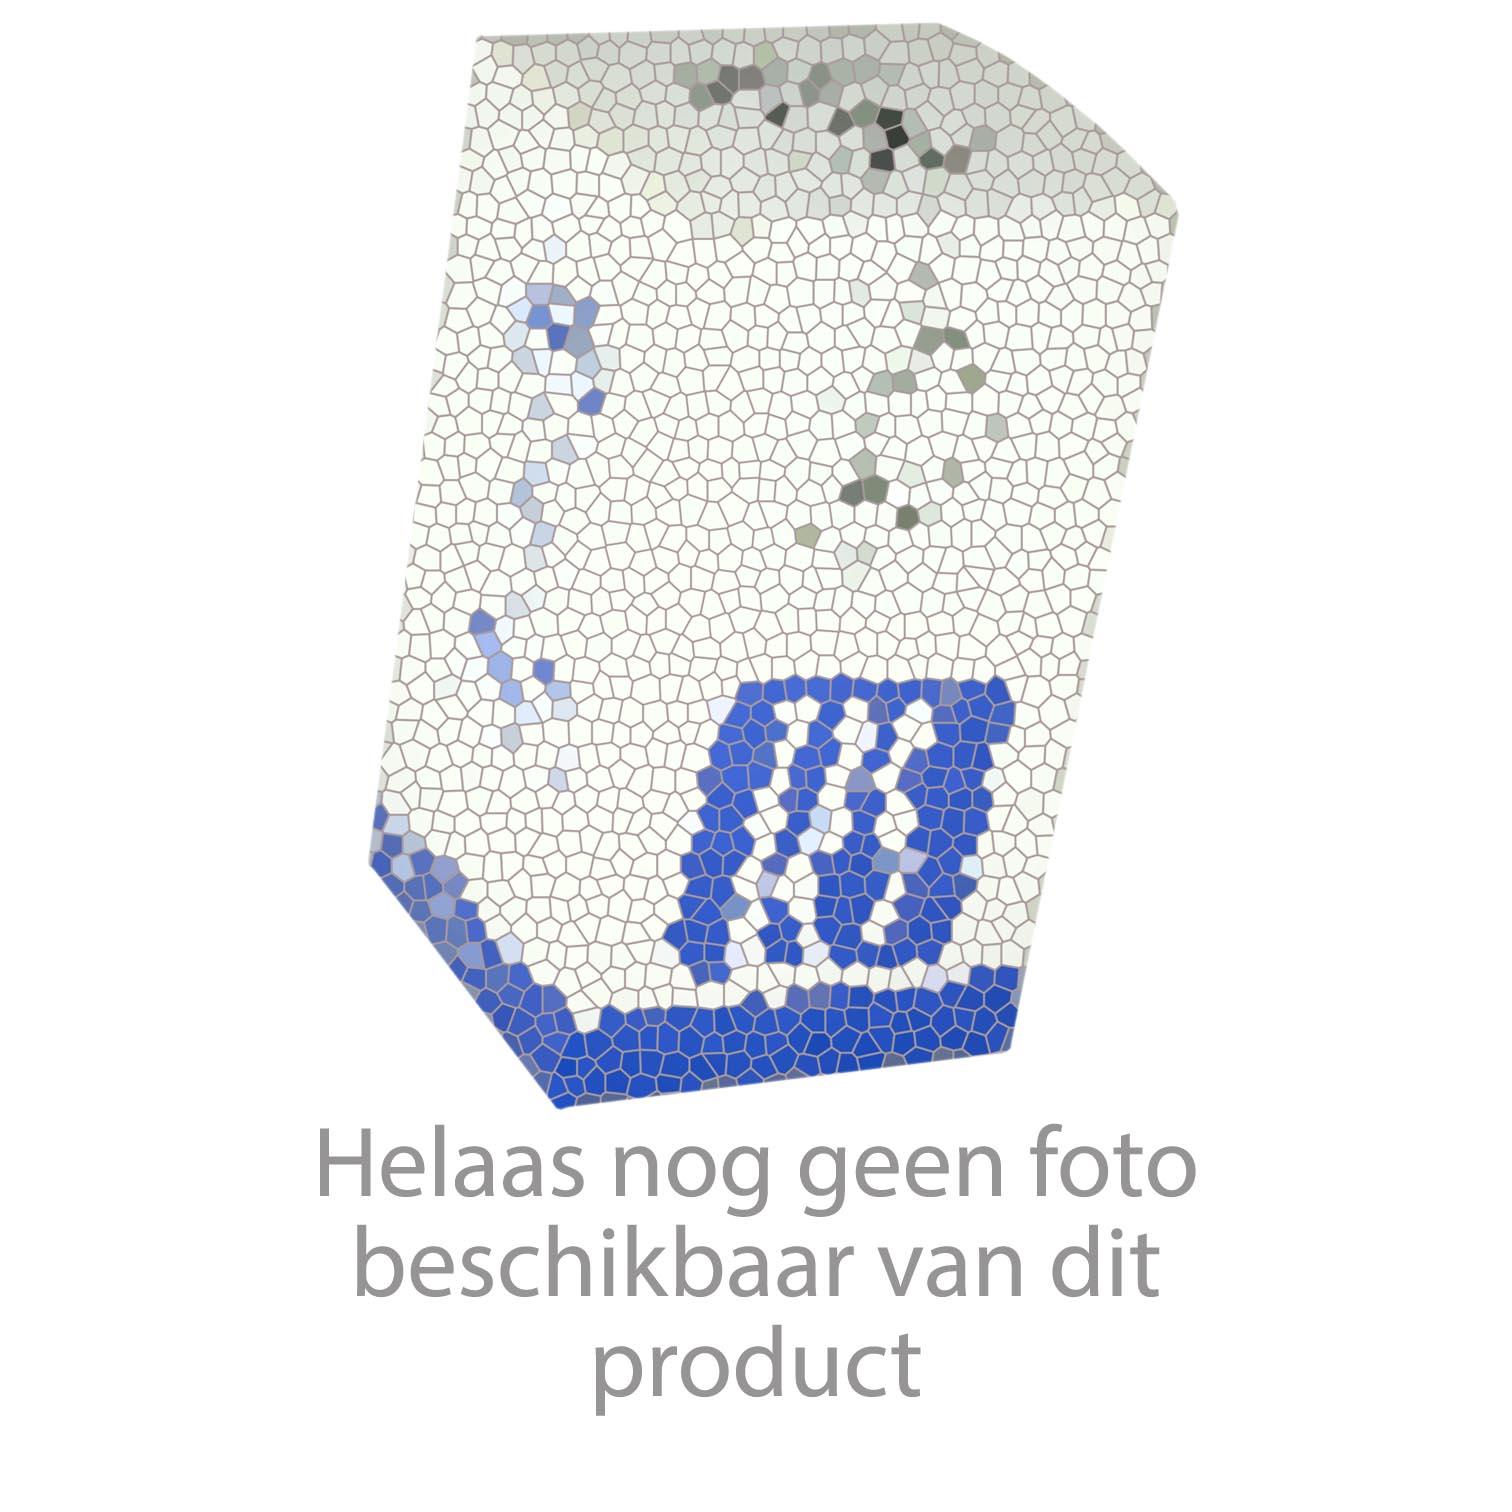 Grohe onderdelen Vitalio Trend Handdouche Artikelnummer 27152000